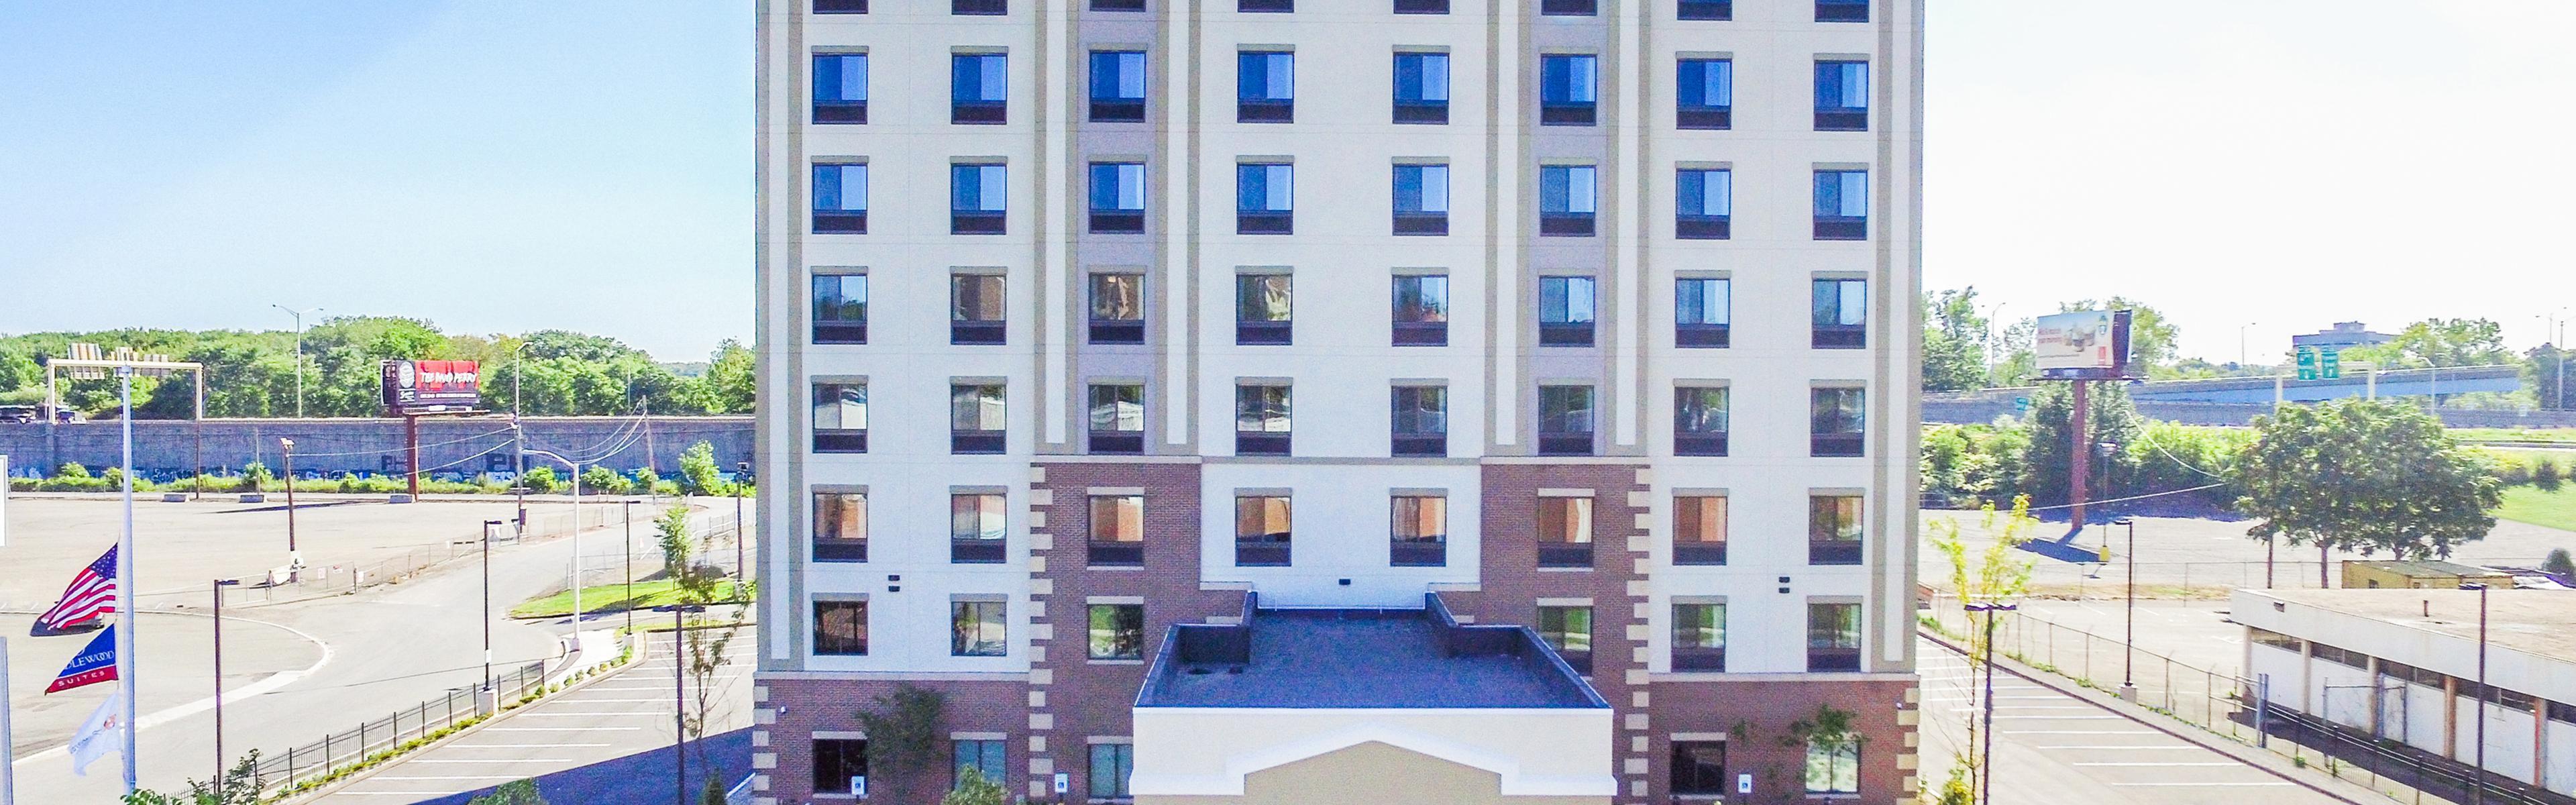 Candlewood Suites Hartford Downtown image 0